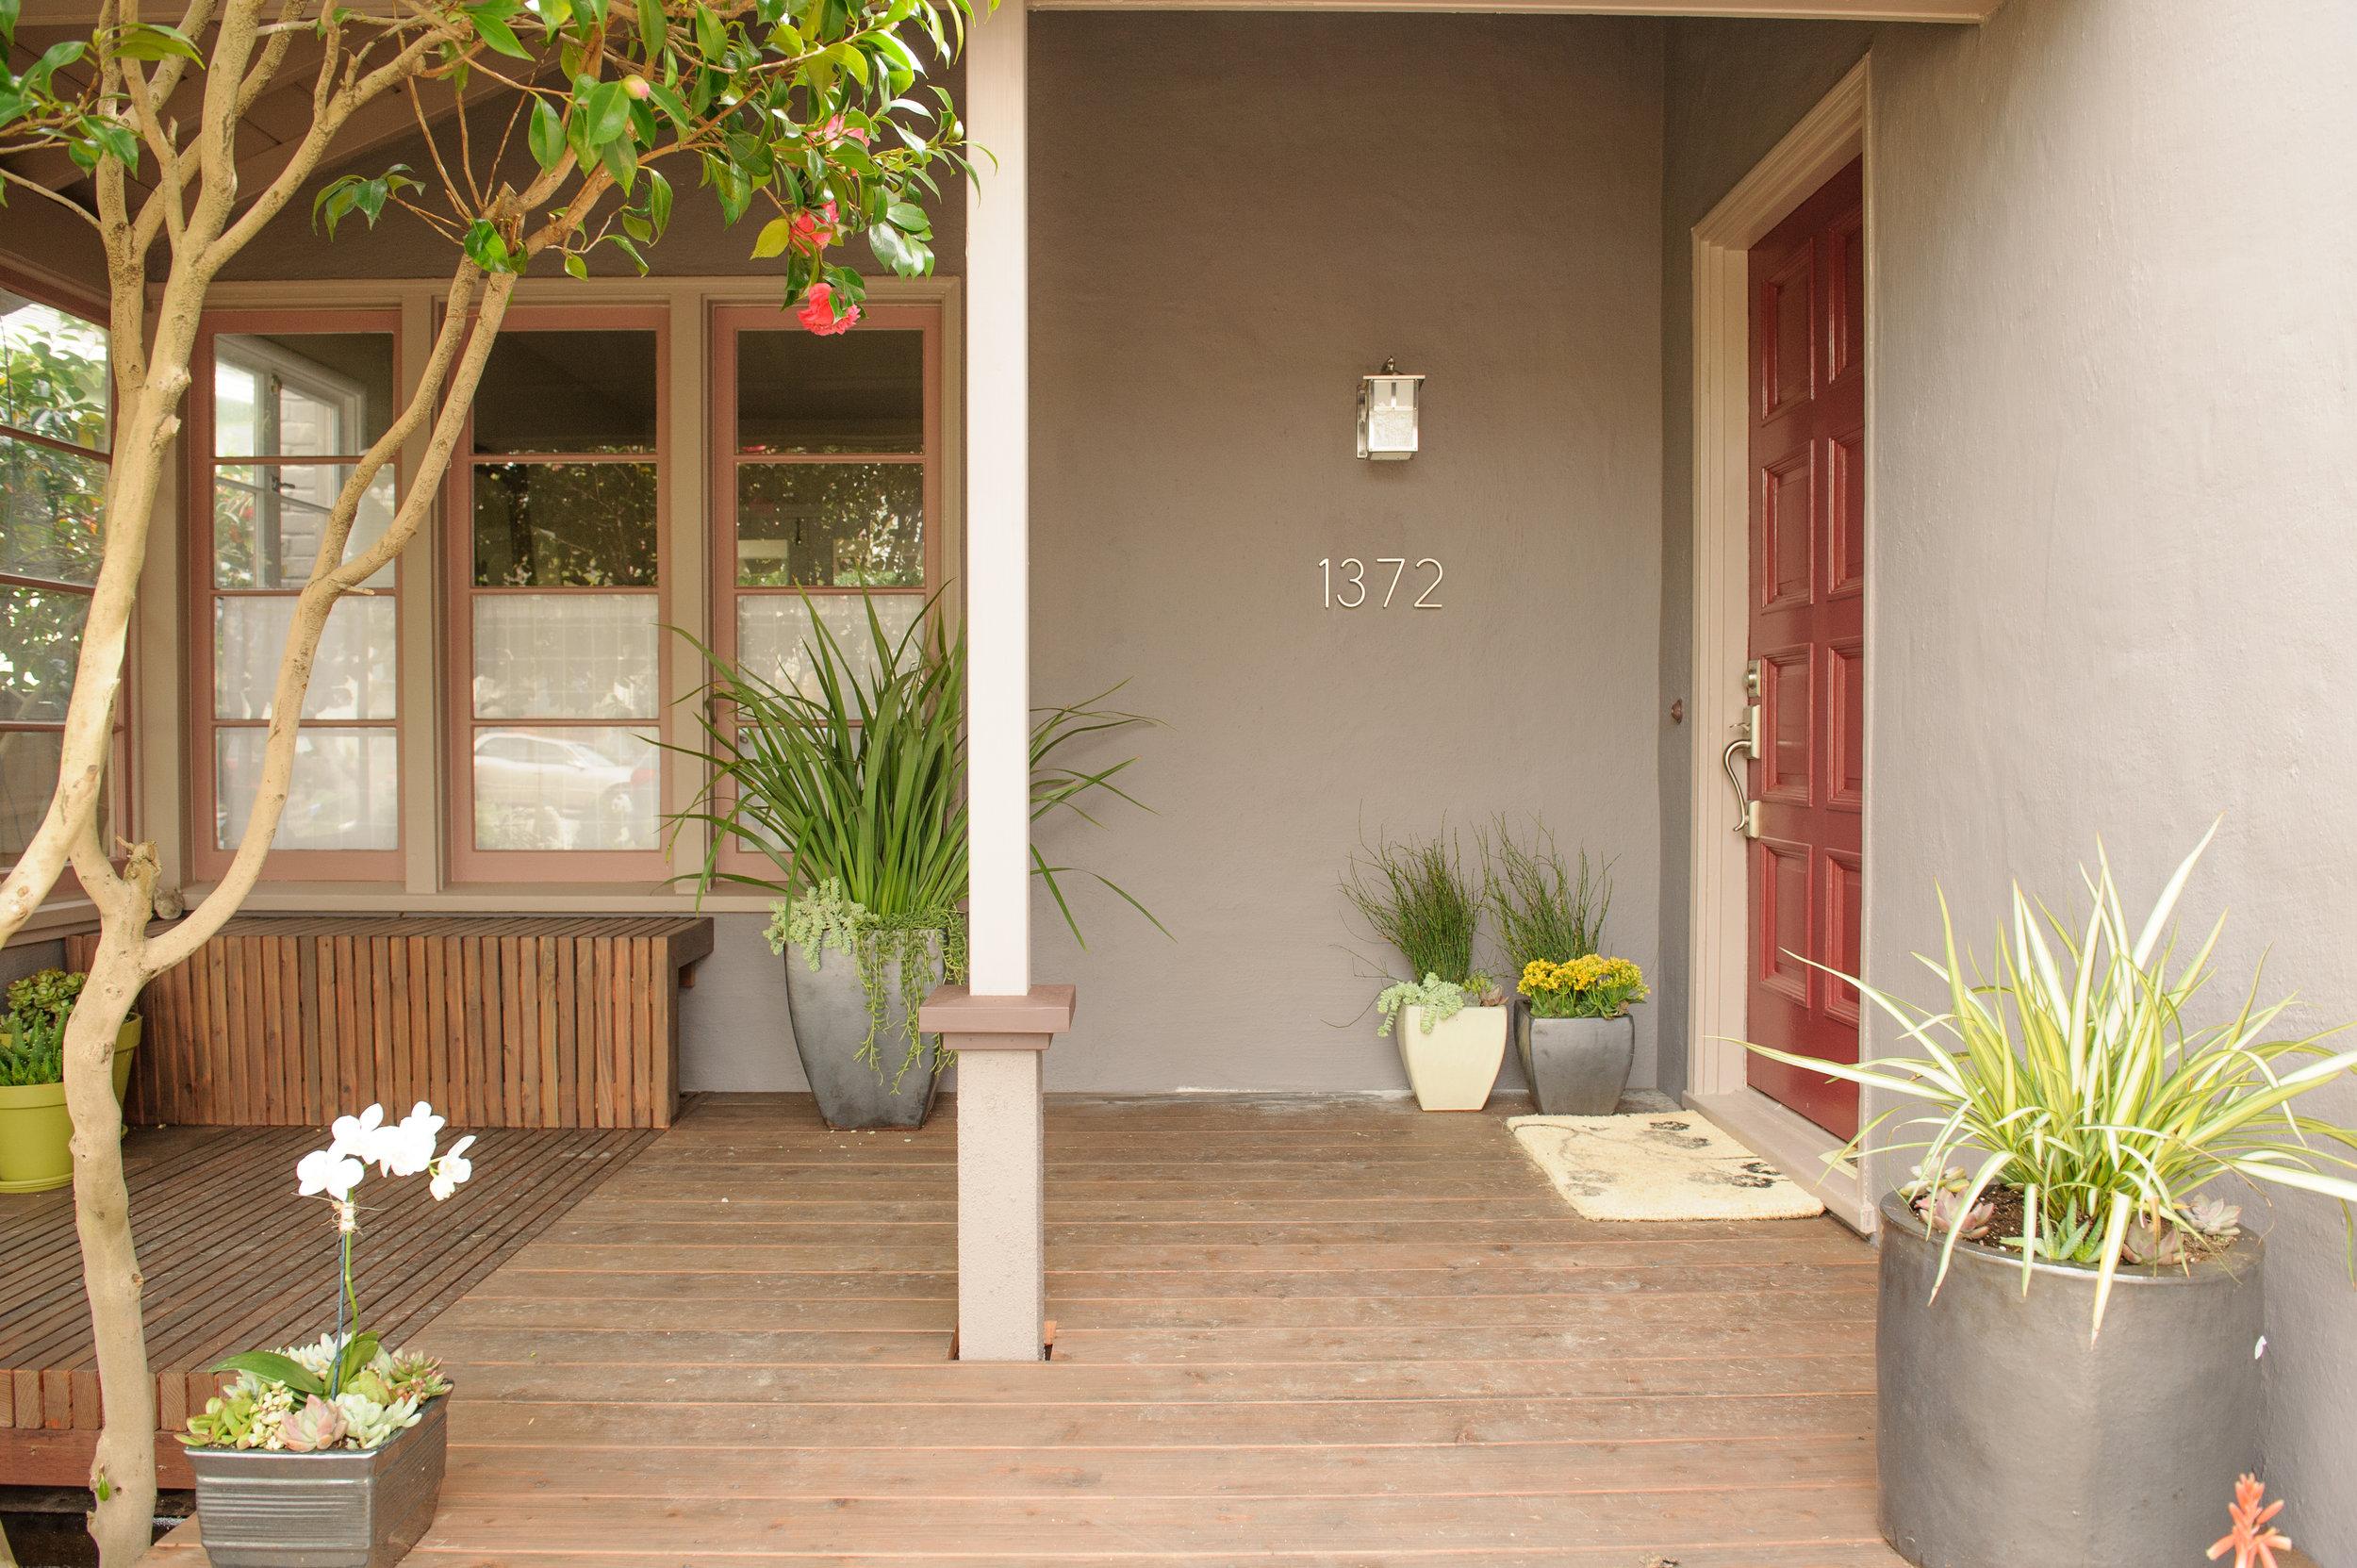 niall david photography - hgtv curb appeal the block - maizel residence-6239.jpg